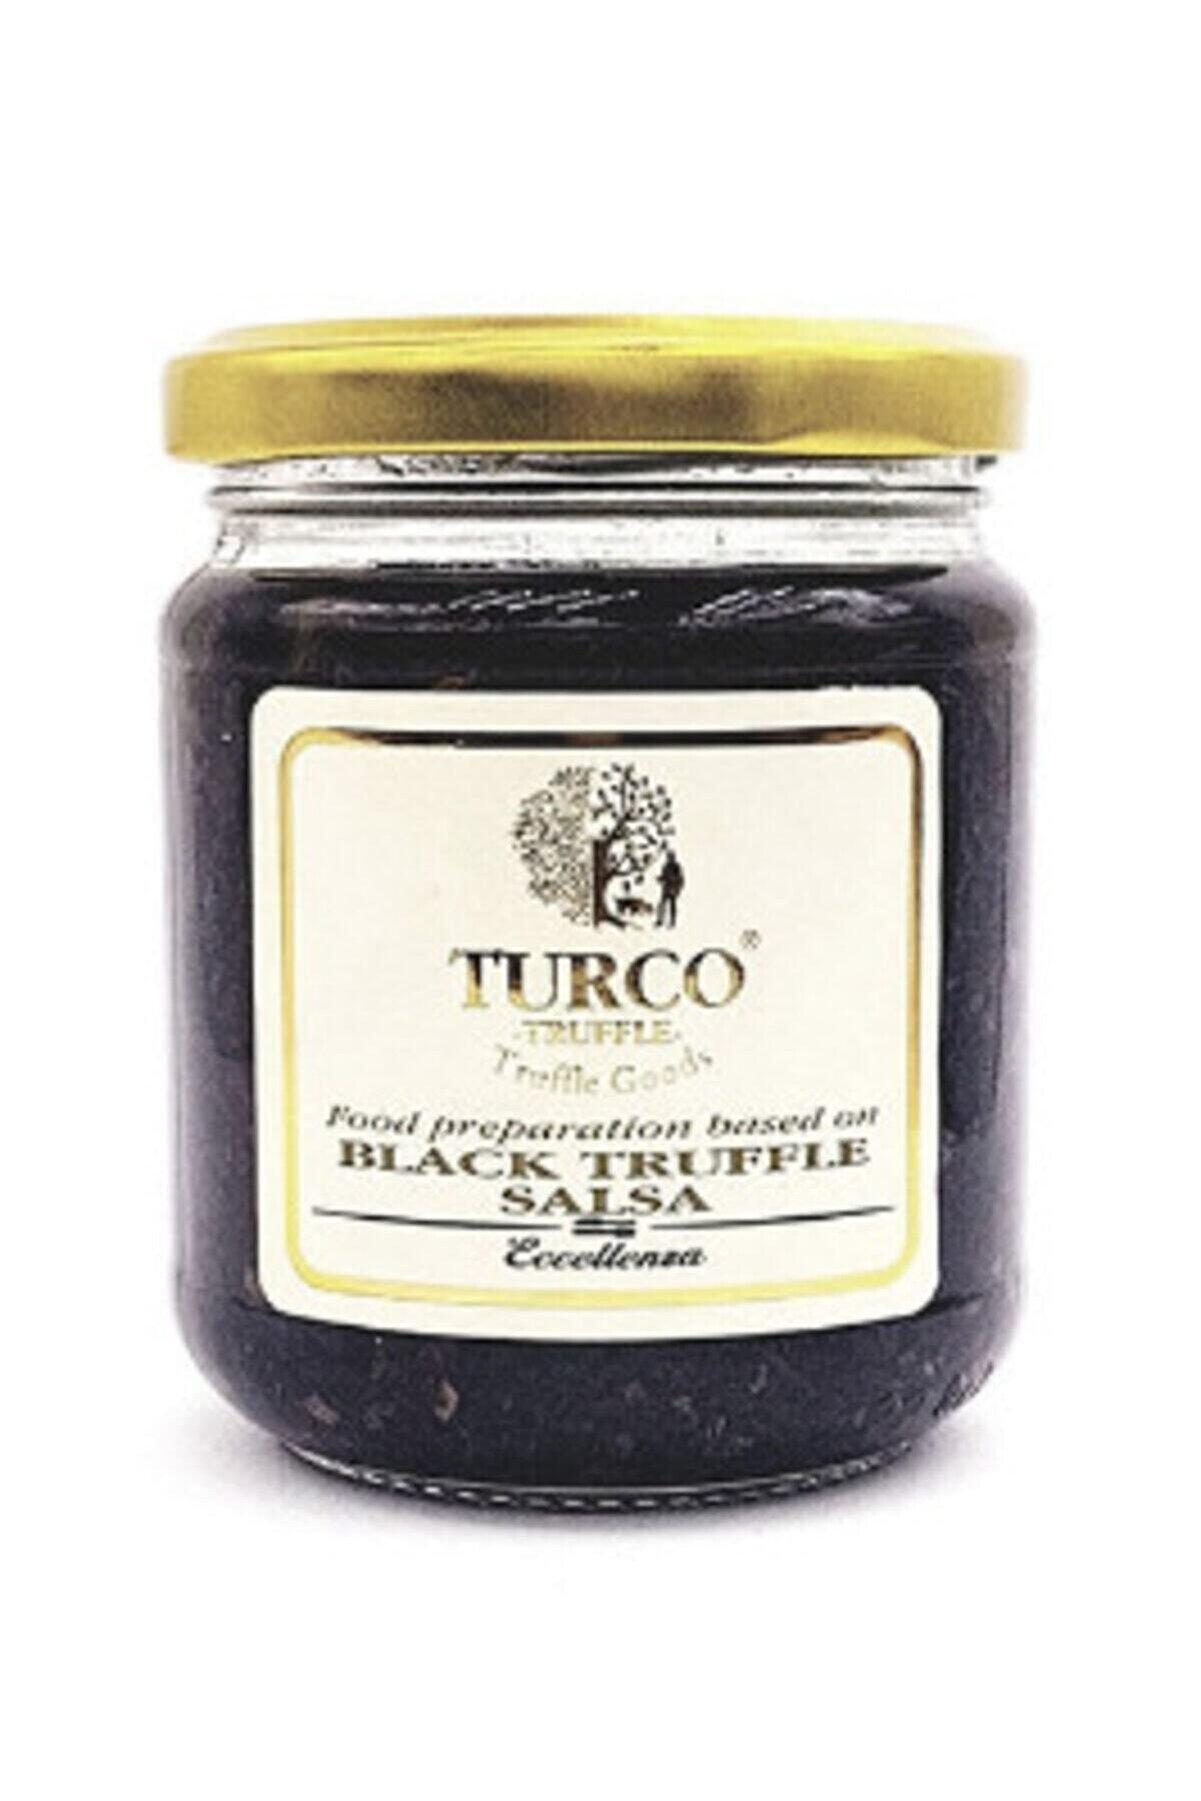 Turco Truffle Siyah Truf Mantar Ezme 170 ggr